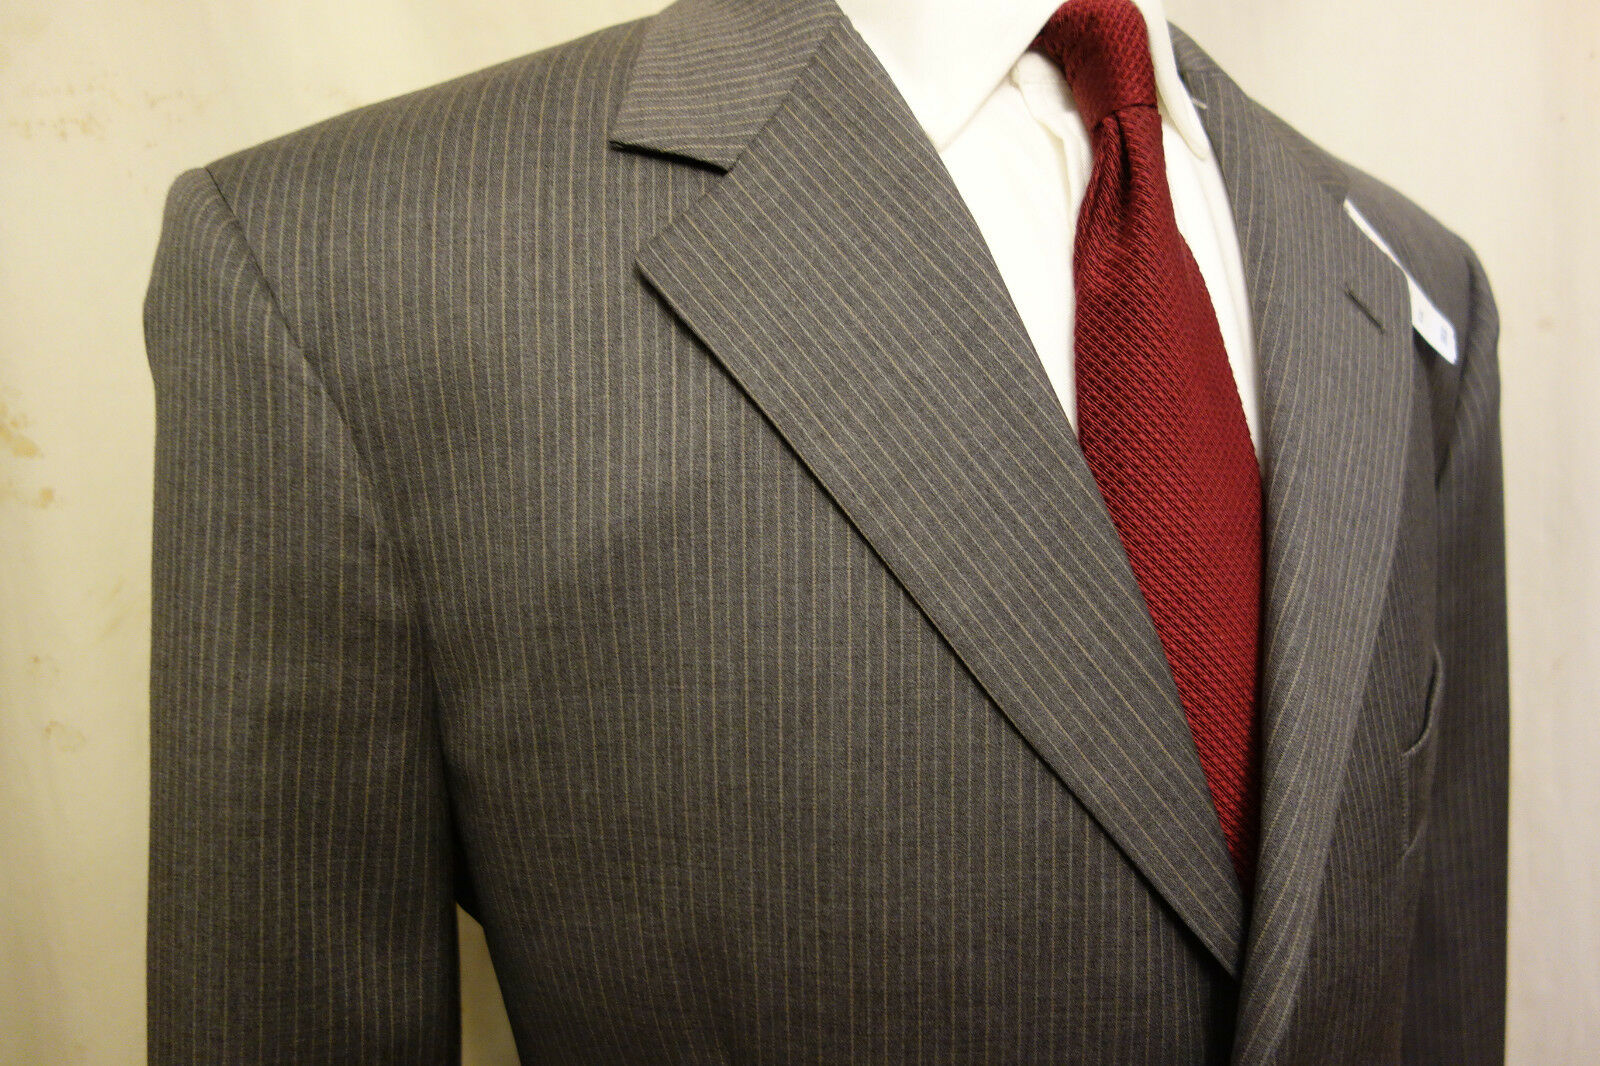 NWT Brooks Brothers 1818 Madison grau Pinstripe Wool Suit 42L  Retail 998